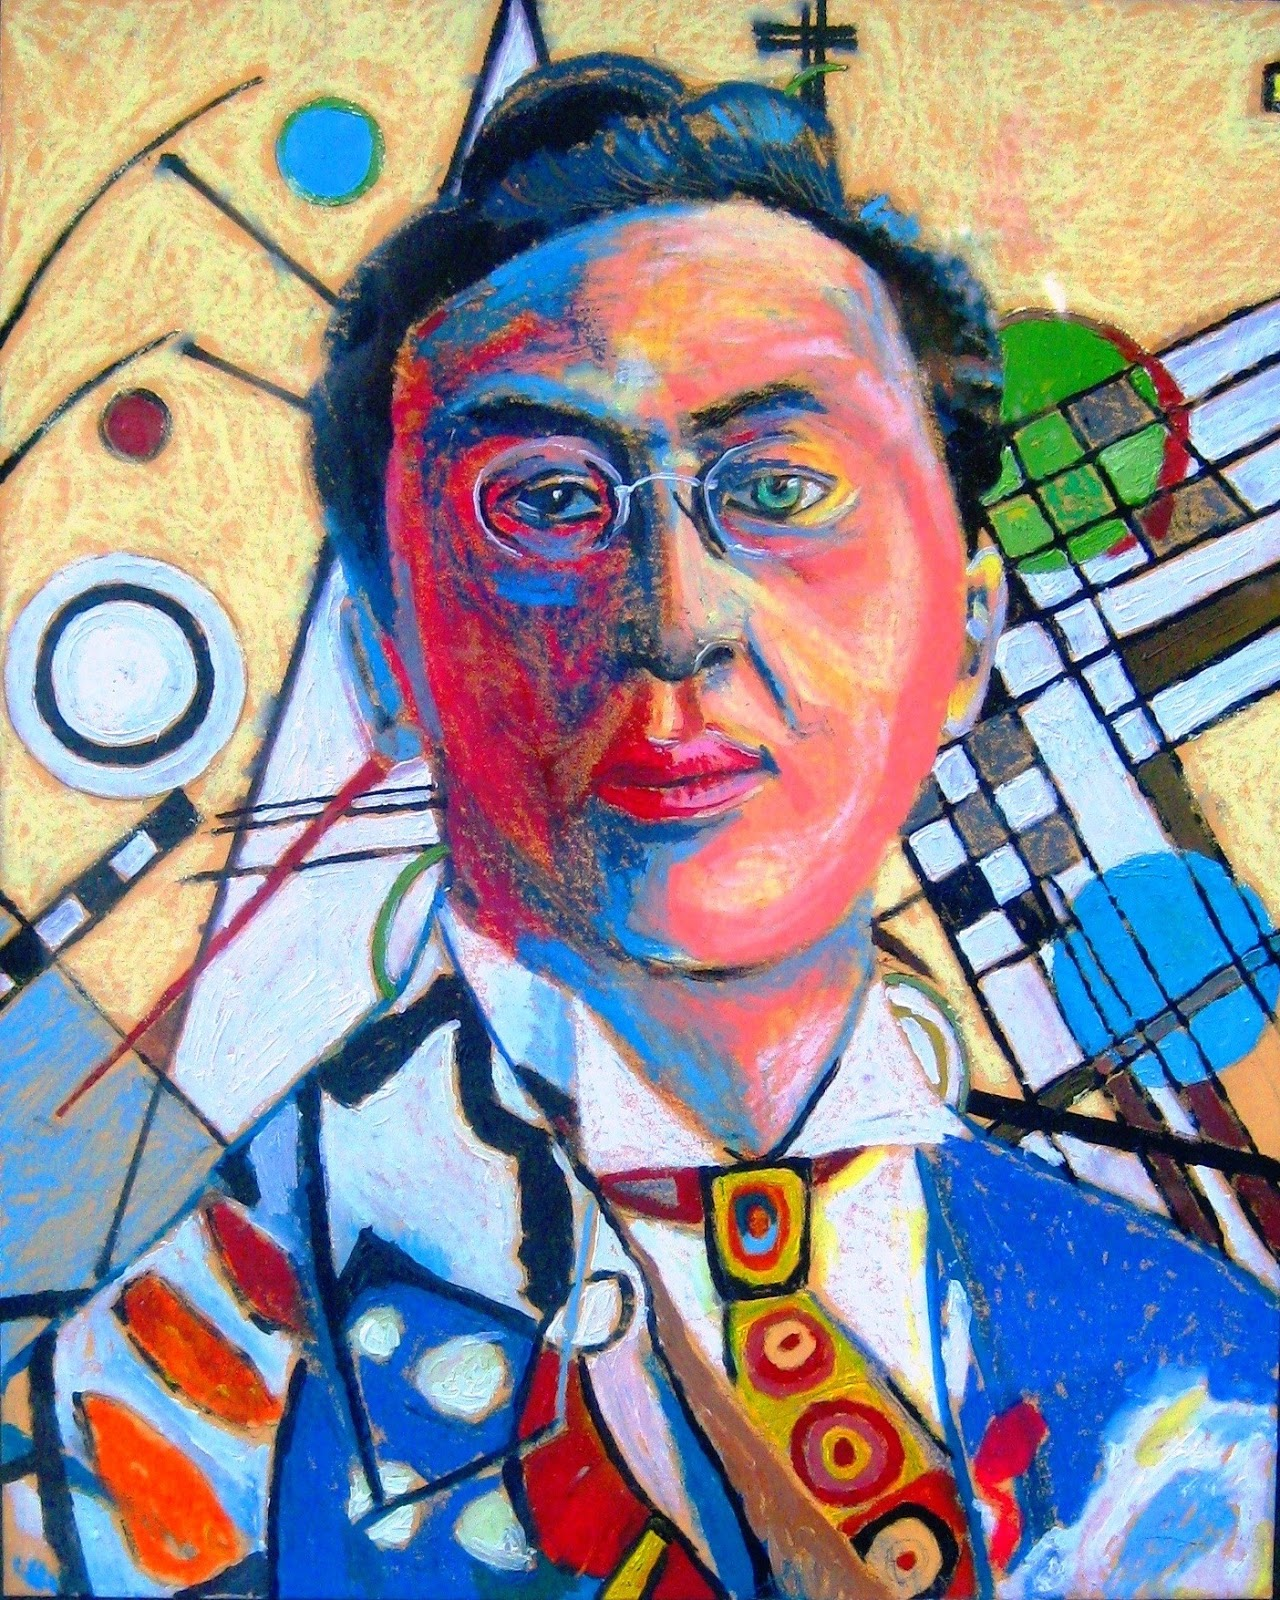 Todd Kruse's Art Blog: Wassily Kandinsky in oil pastels